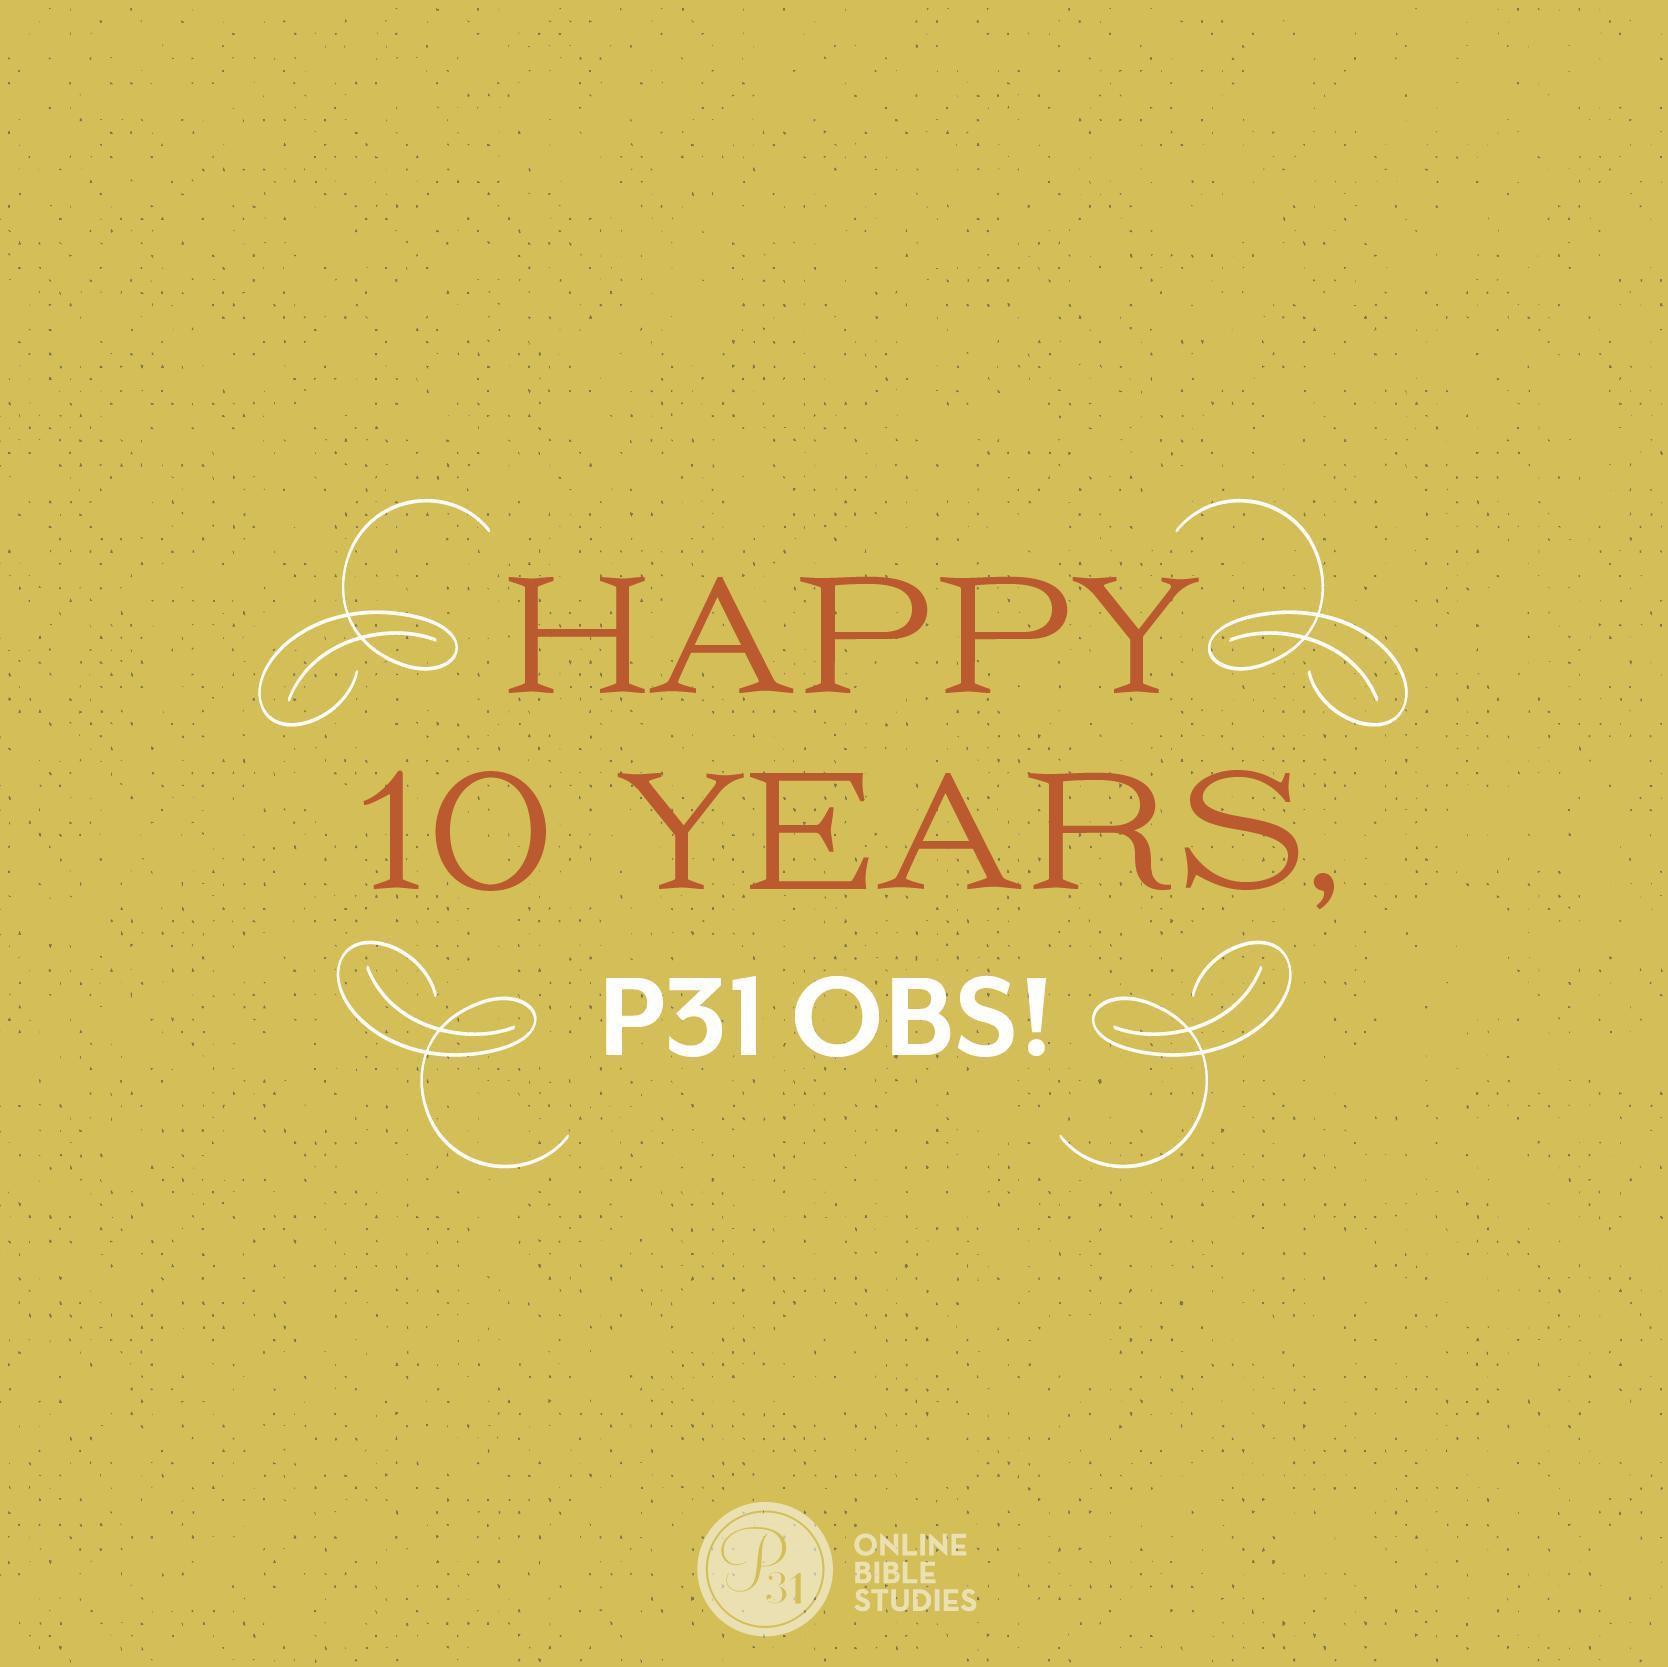 P31 Online Bible Studies | 10 Year Anniversary